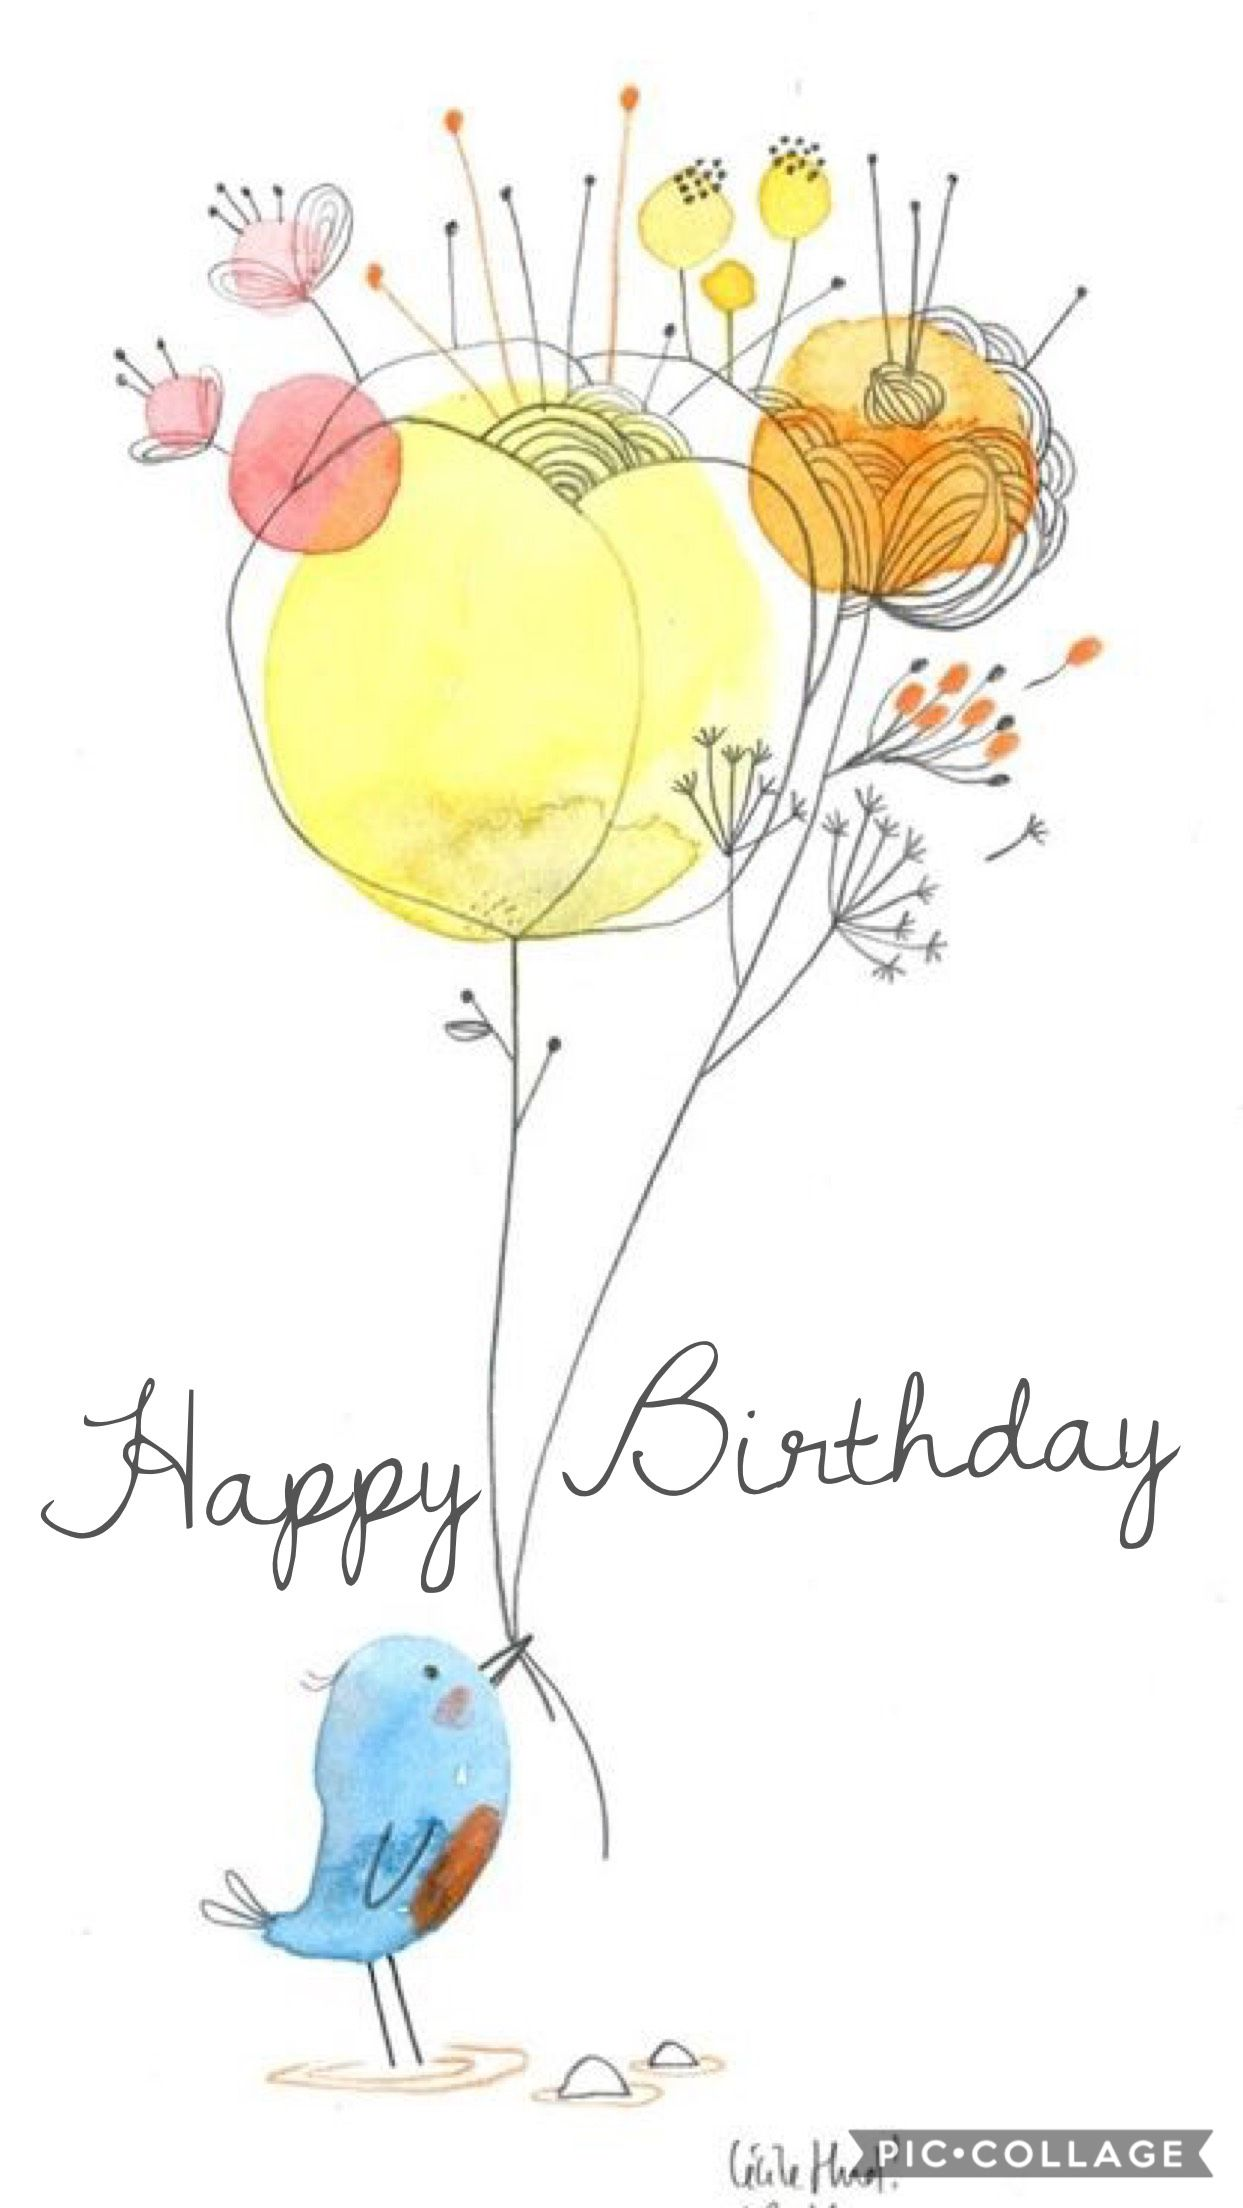 Happy birthday birthday wishes pinterest happy birthday happy birthday birthday card quoteshappy birthday messagesbirthday greetings friendcard m4hsunfo